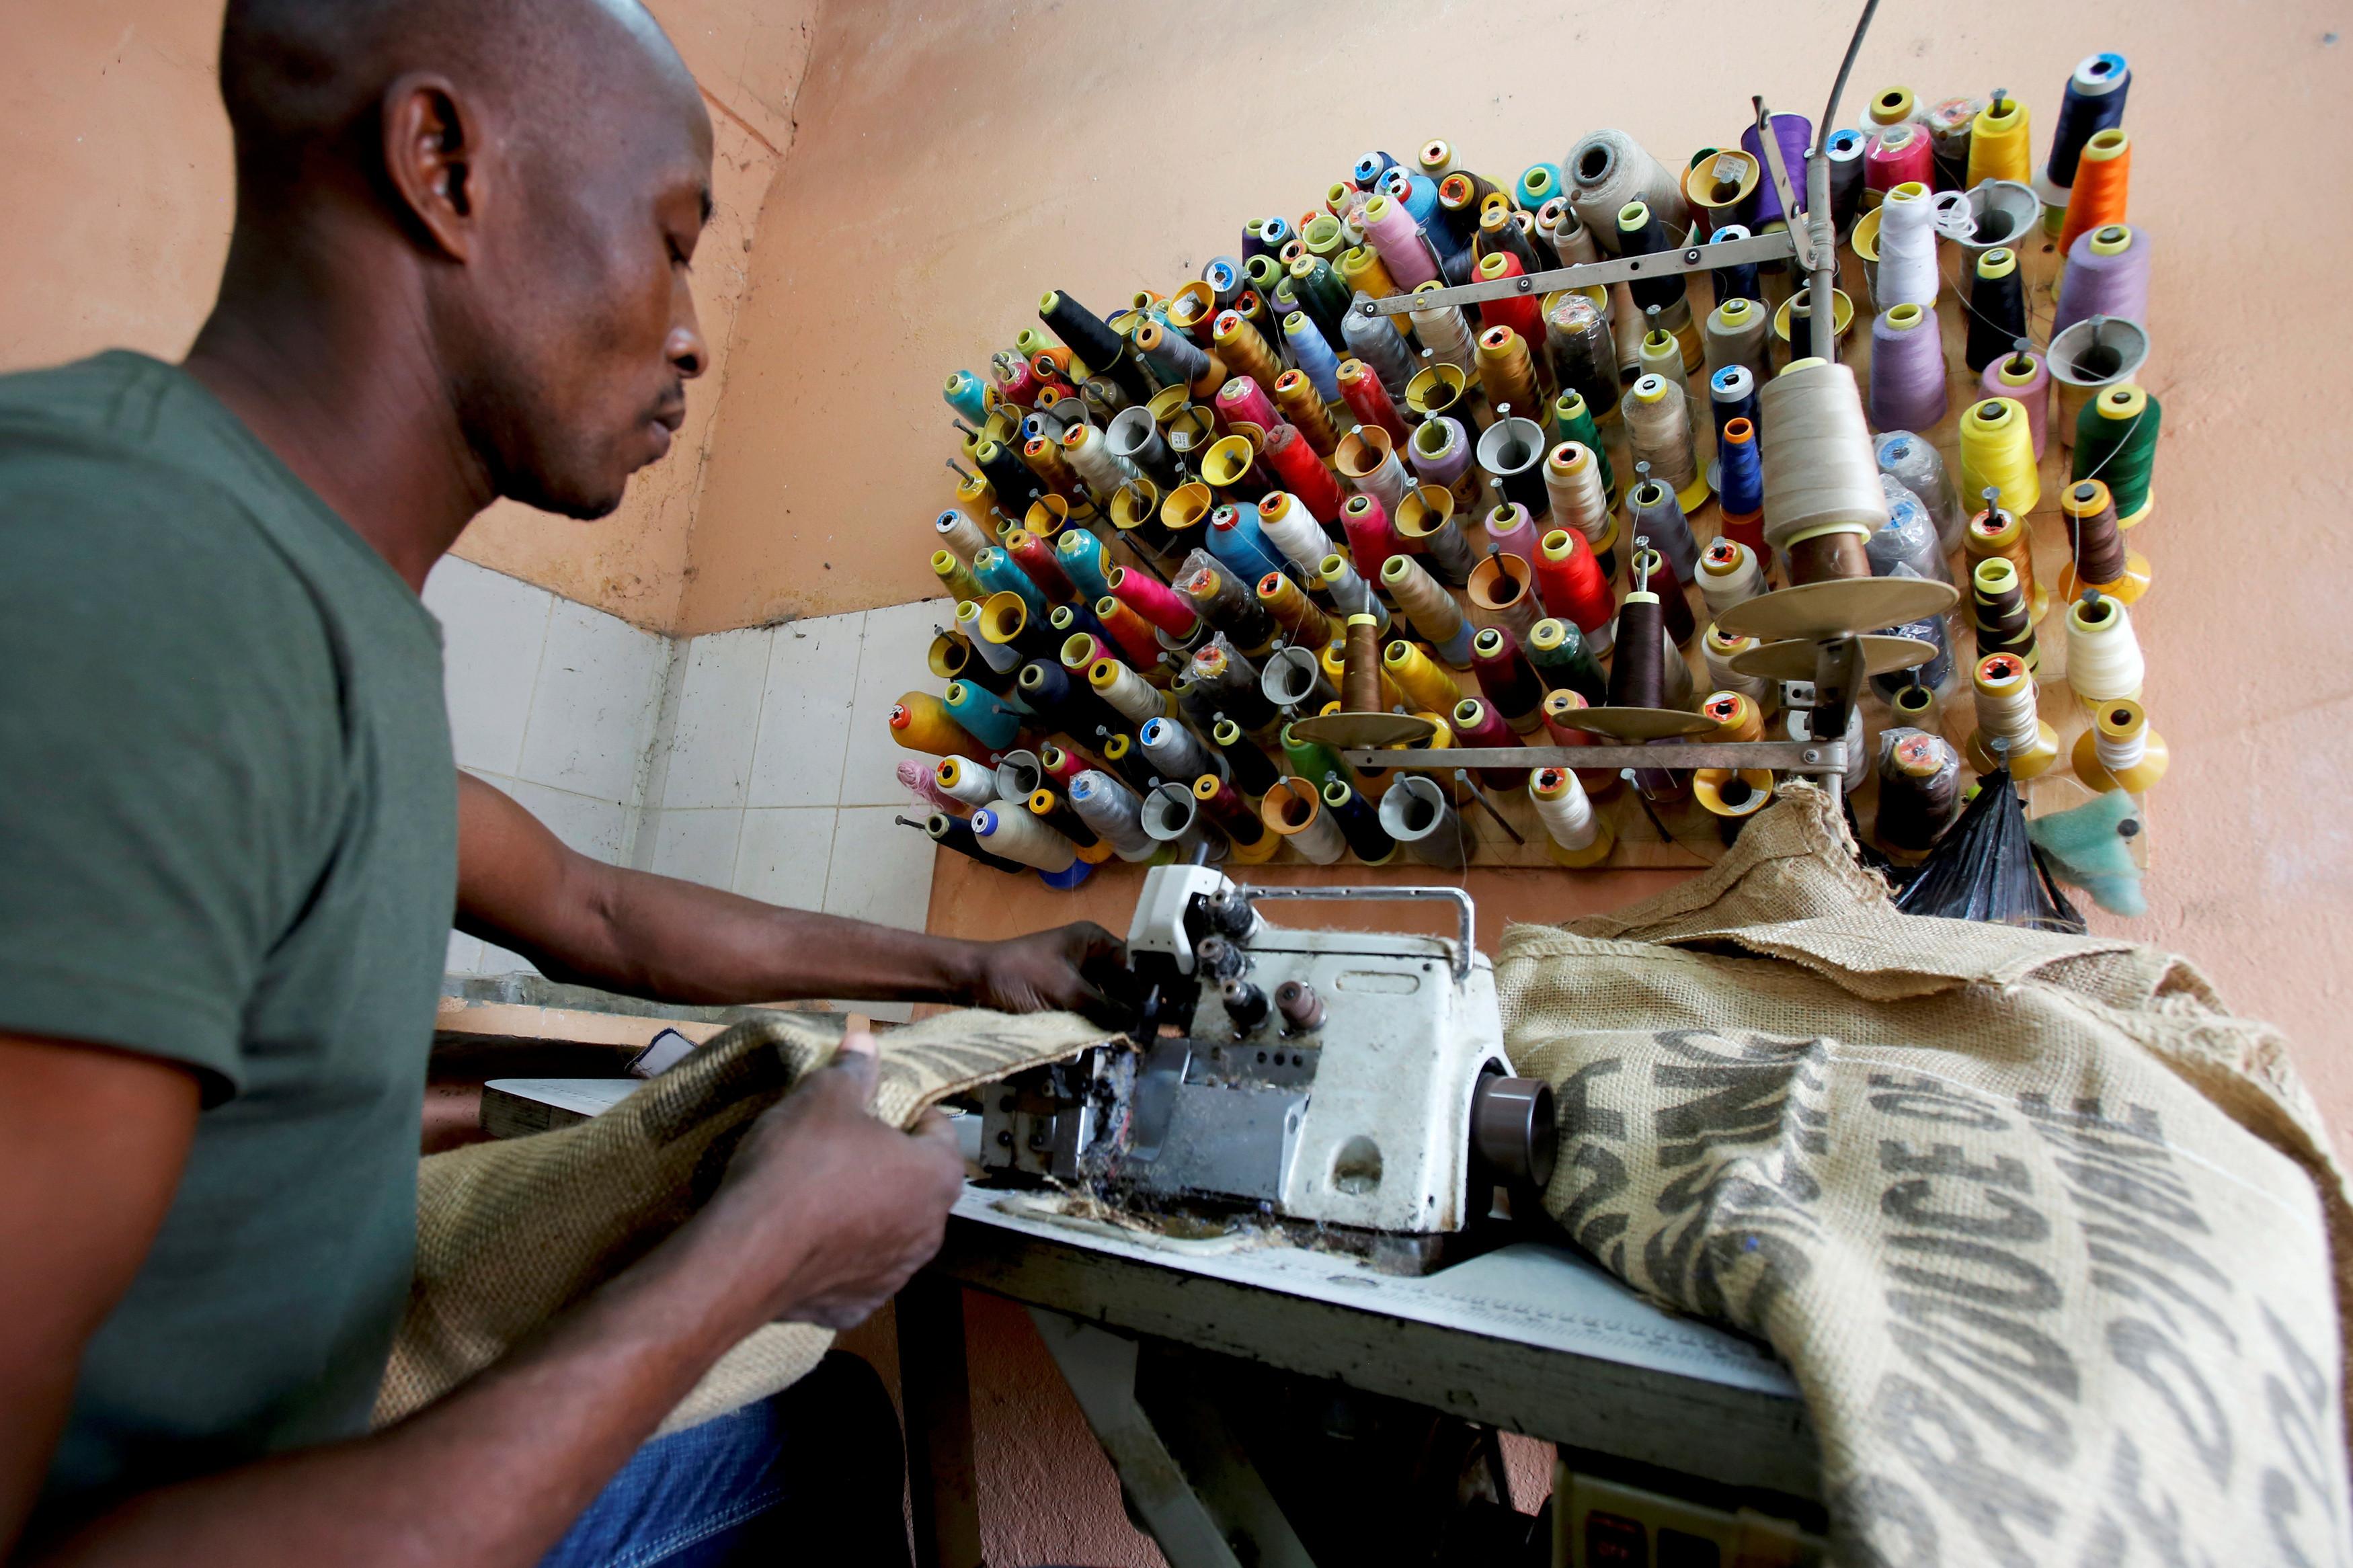 A man works on a sewing machine inside the workshop of Ivory coast fashion designer Liliane Estievenart, 45, in Abidjan, Ivory Coast July 22, 2017. Picture taken July 22, 2017. REUTERS/Thierry Gouegnon - RC151B9D8610